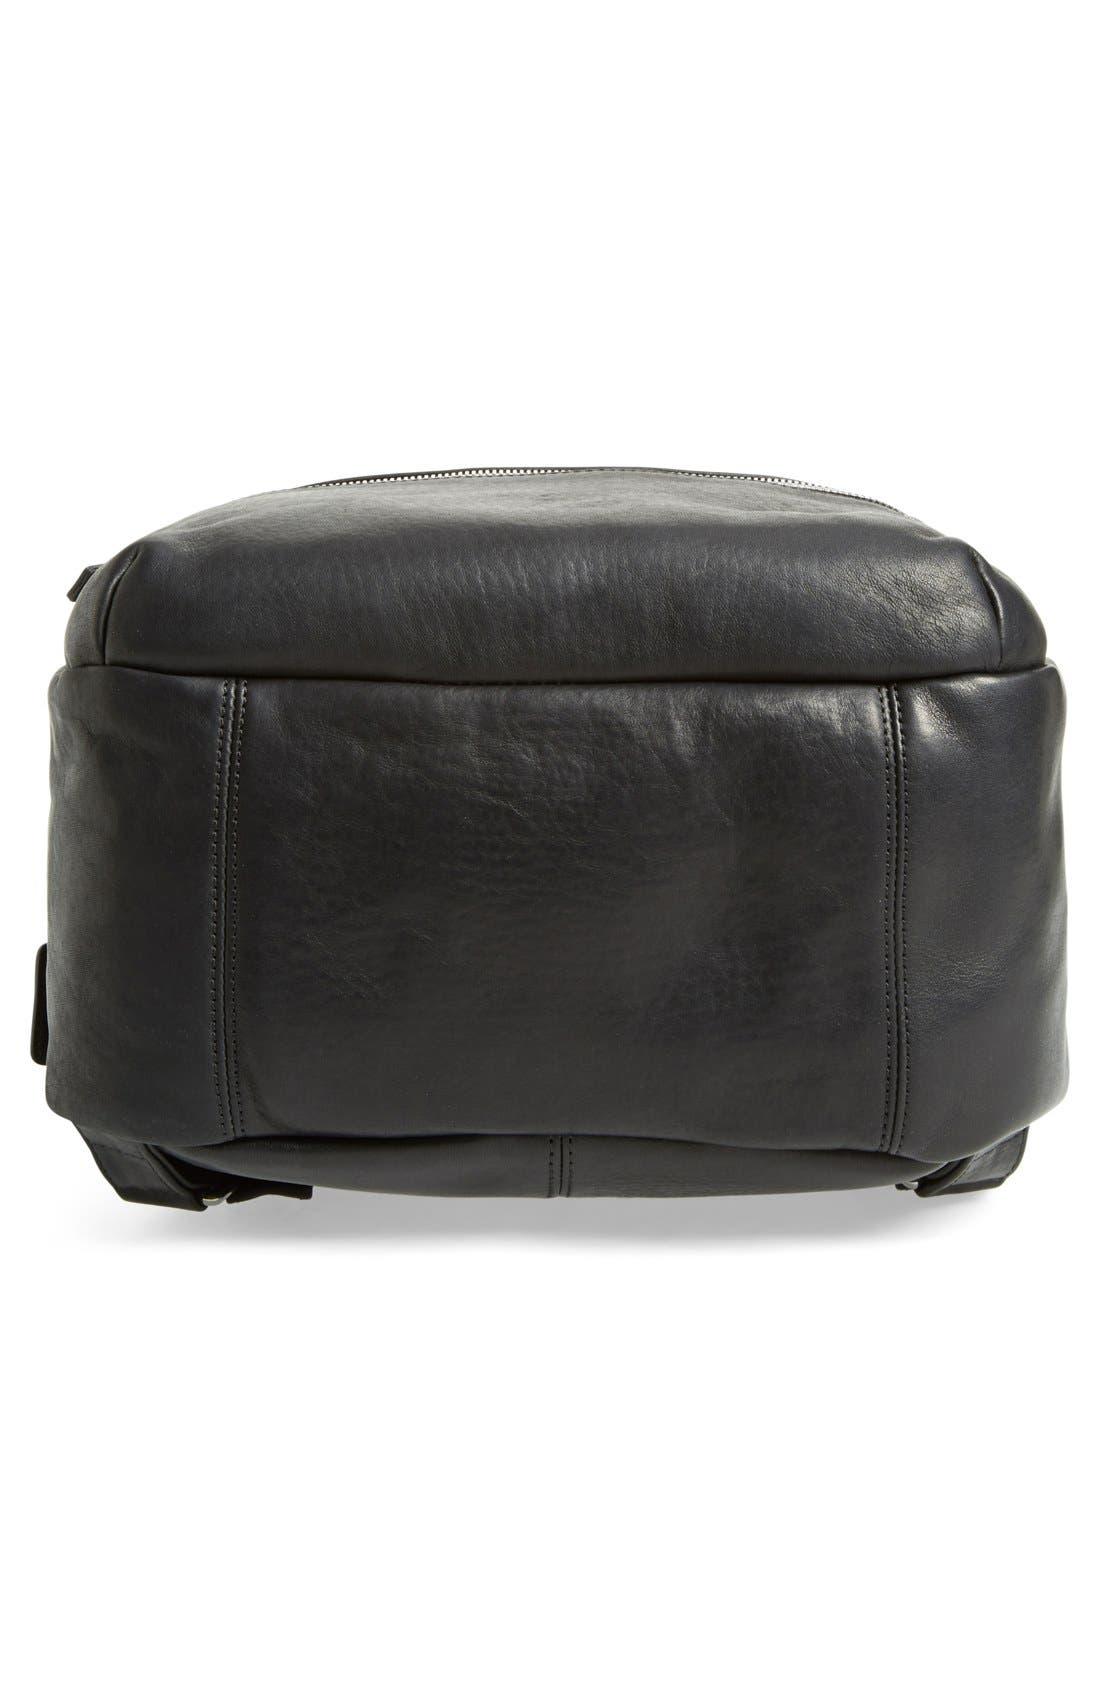 Runwell Leather Laptop Backpack,                             Alternate thumbnail 6, color,                             Black